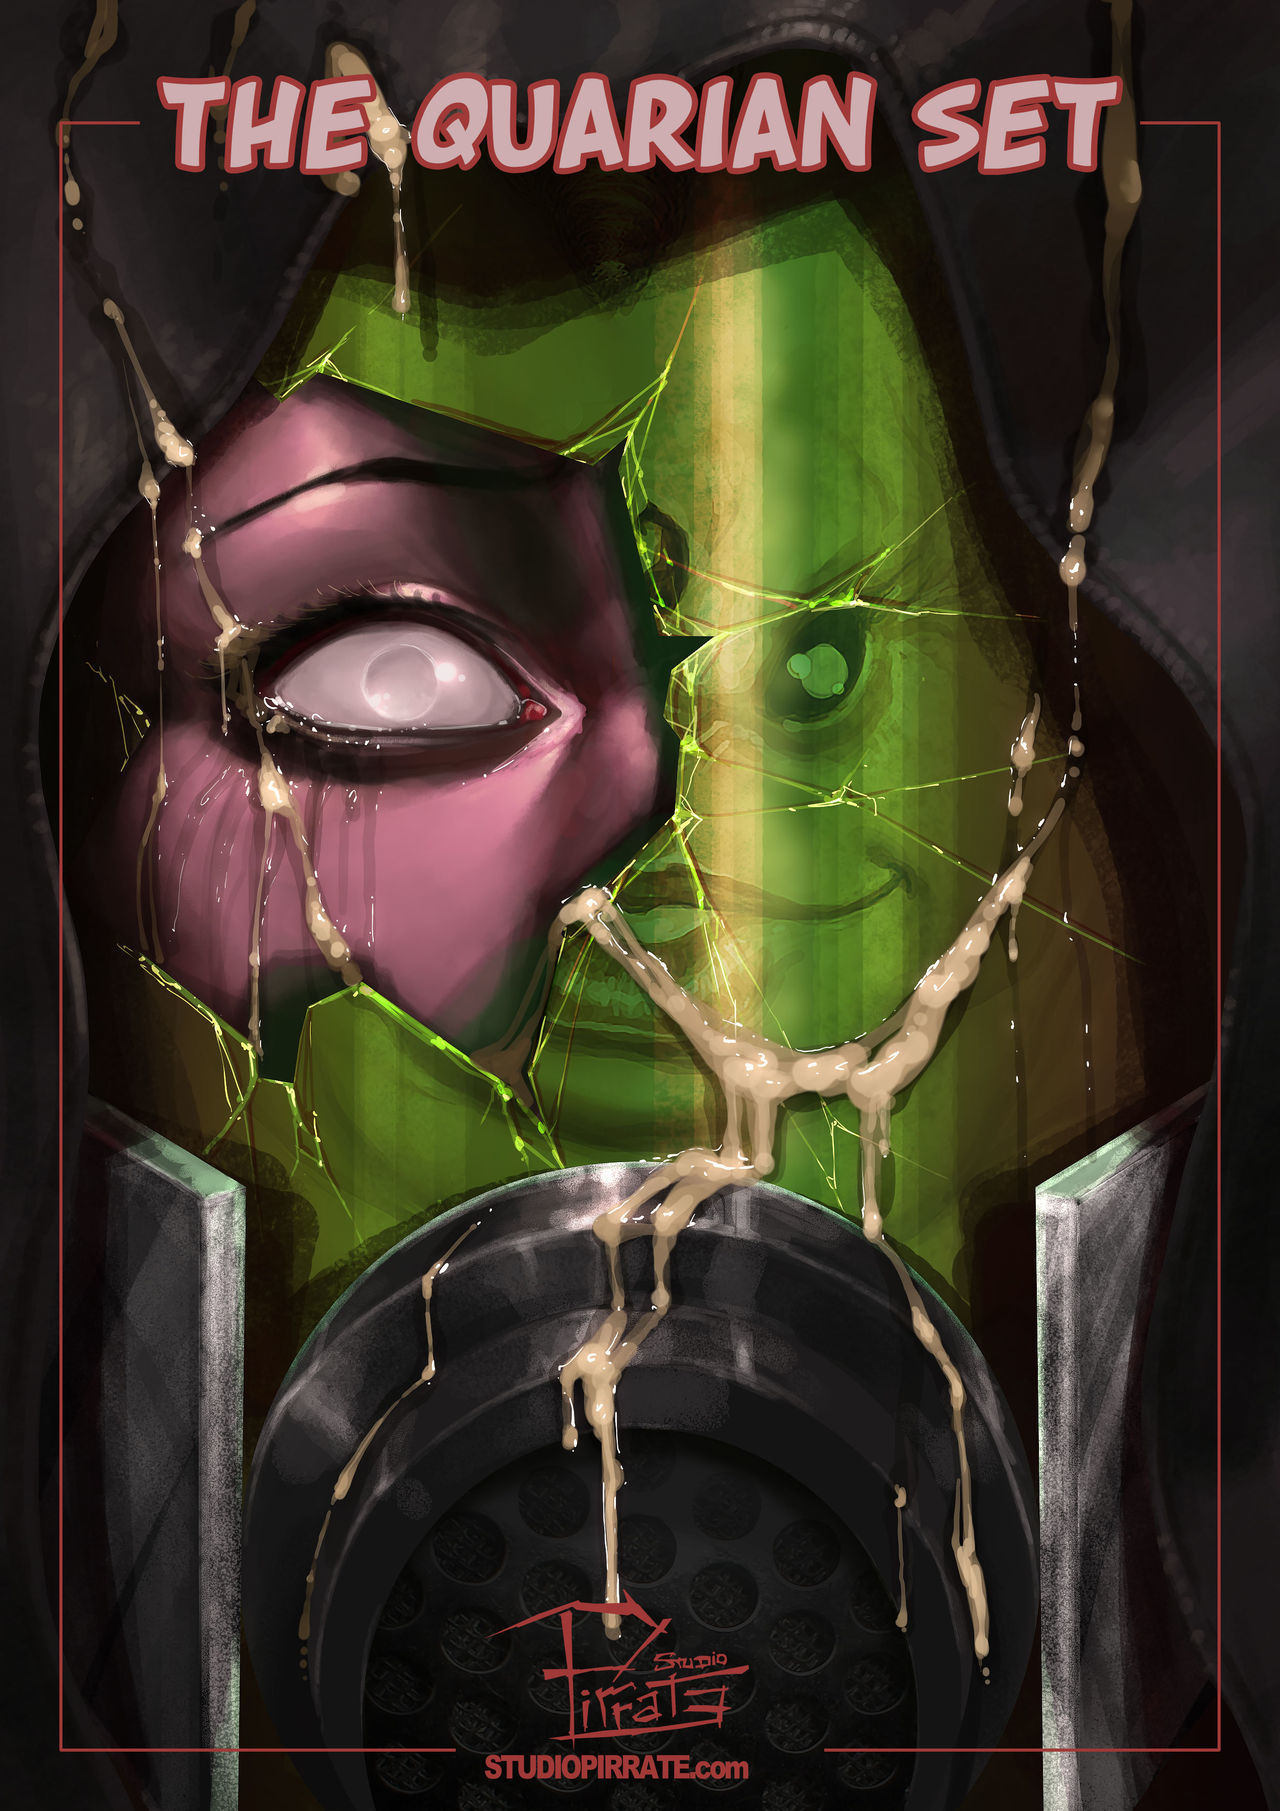 The_Quarian_Set_-_Studio-Pirrate_[Mass_Effect] comix.jpg